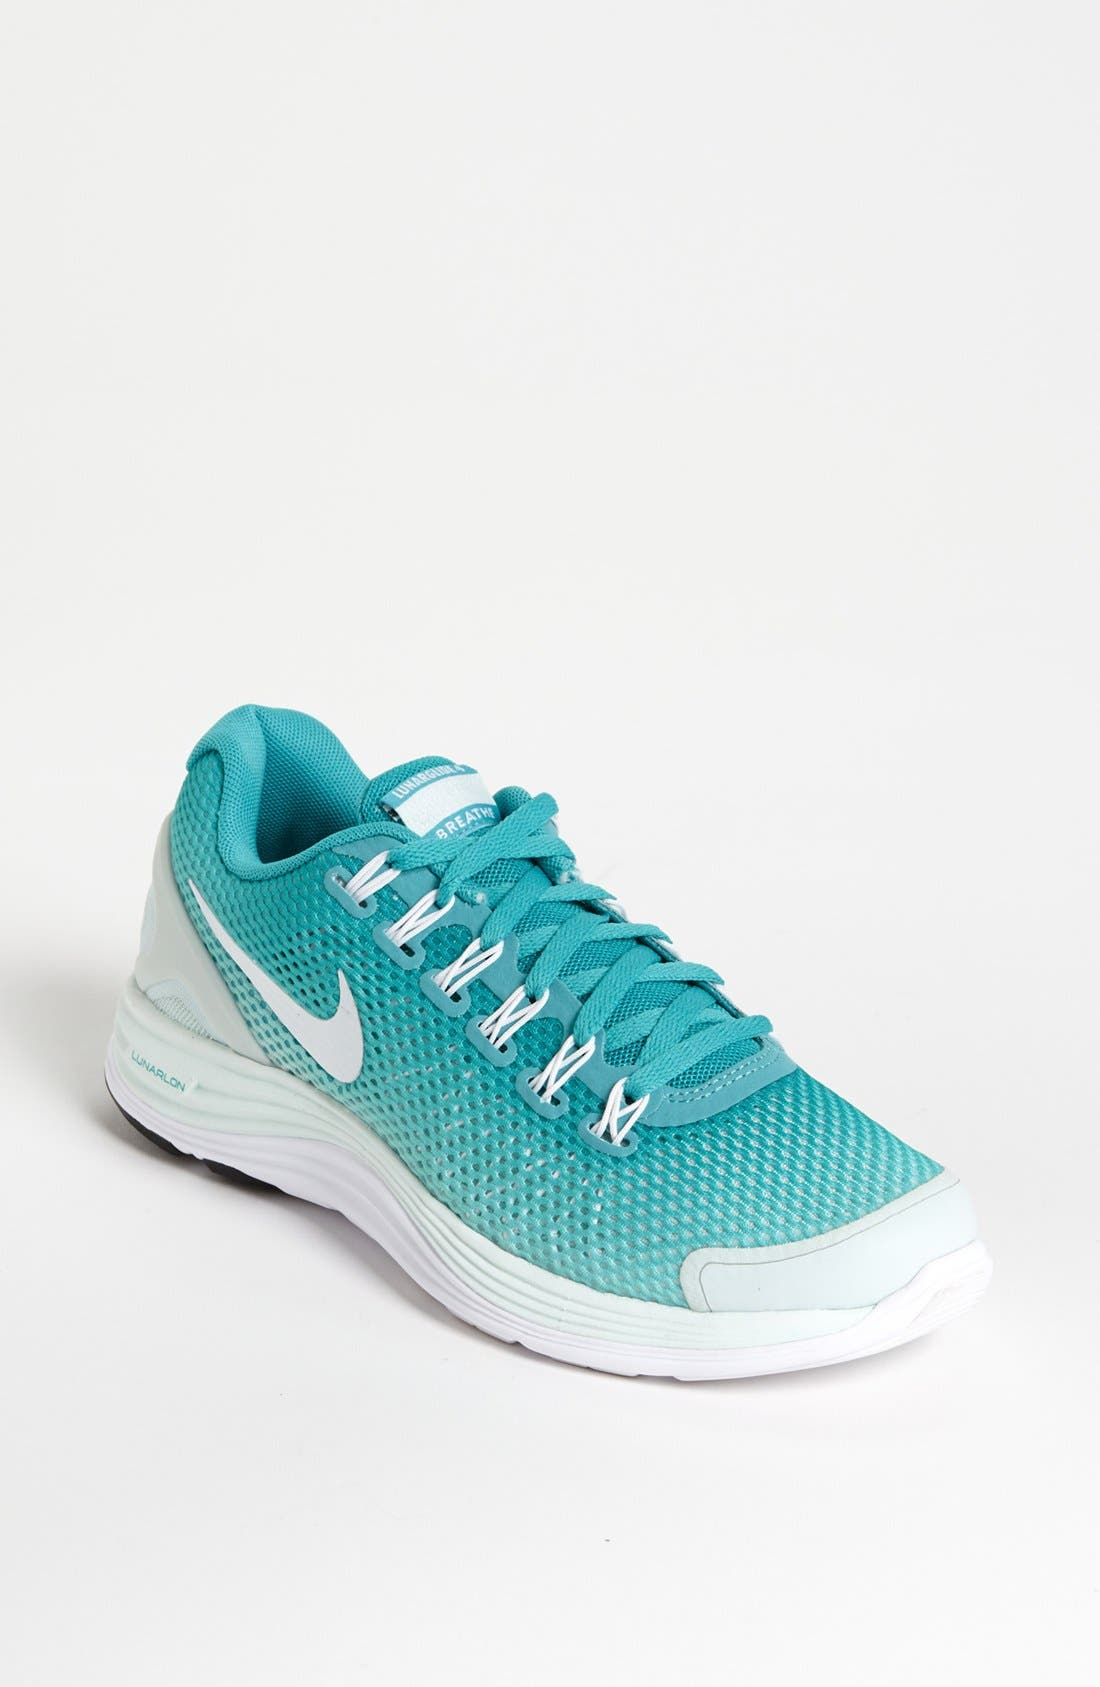 Main Image - Nike 'LunarGlide 4 Breathe' Running Shoe (Women)